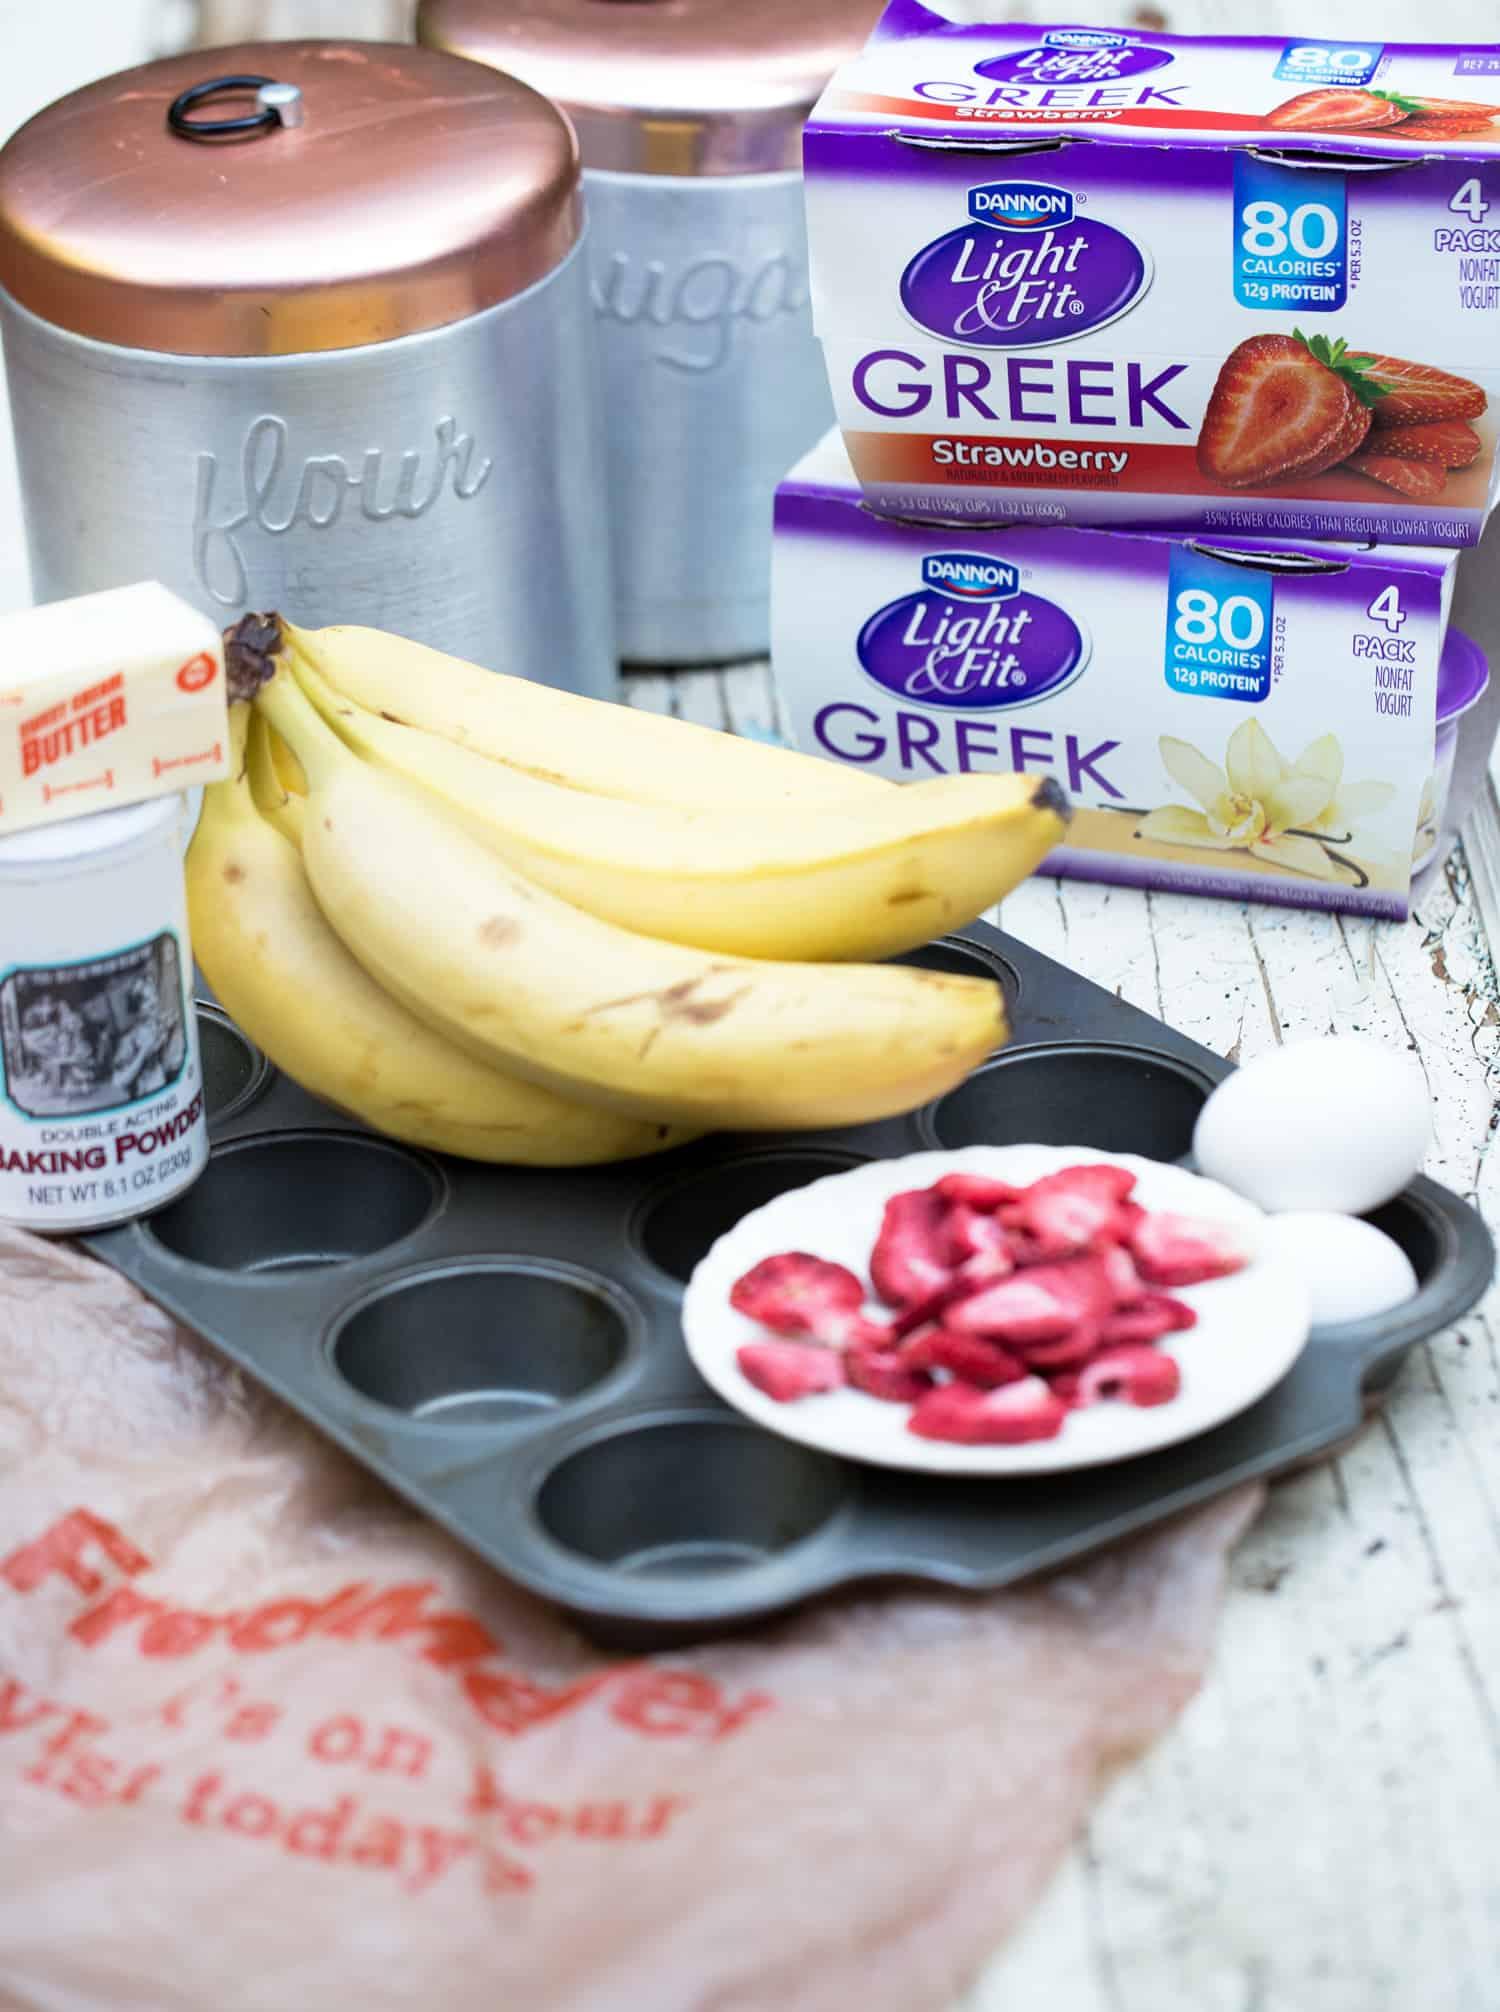 strawberry banana muffins recipe ingredients